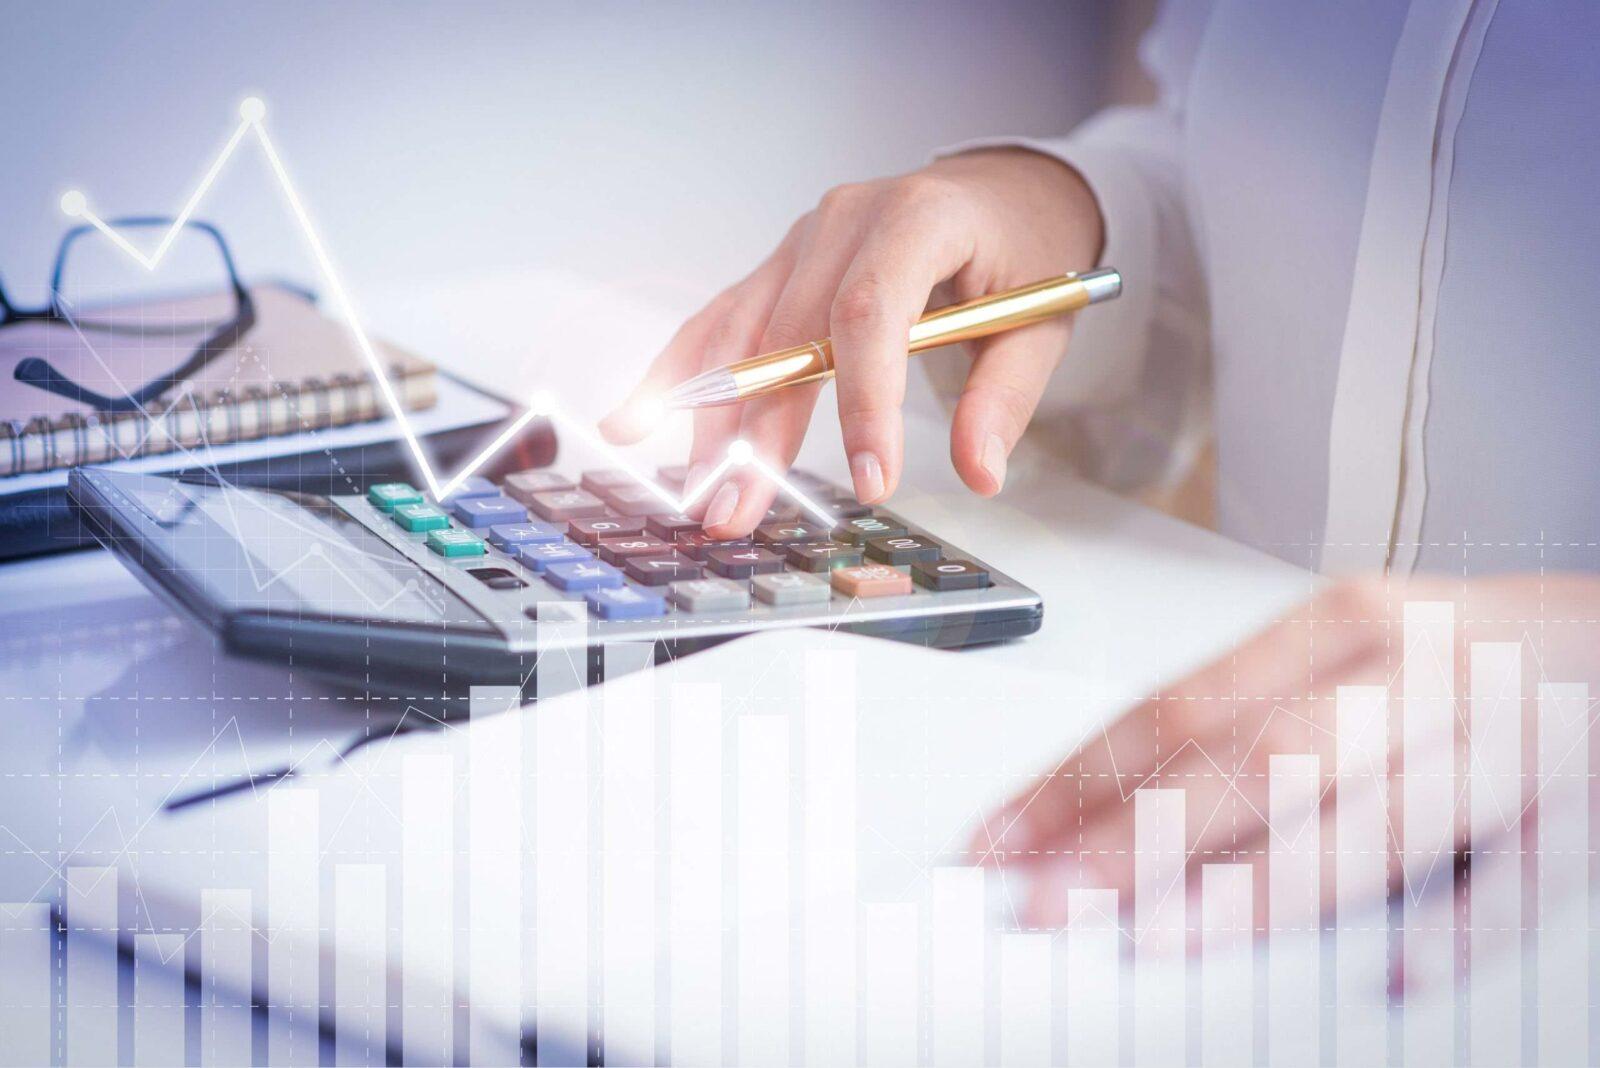 Creative Cash Flow for Struggling Businesses